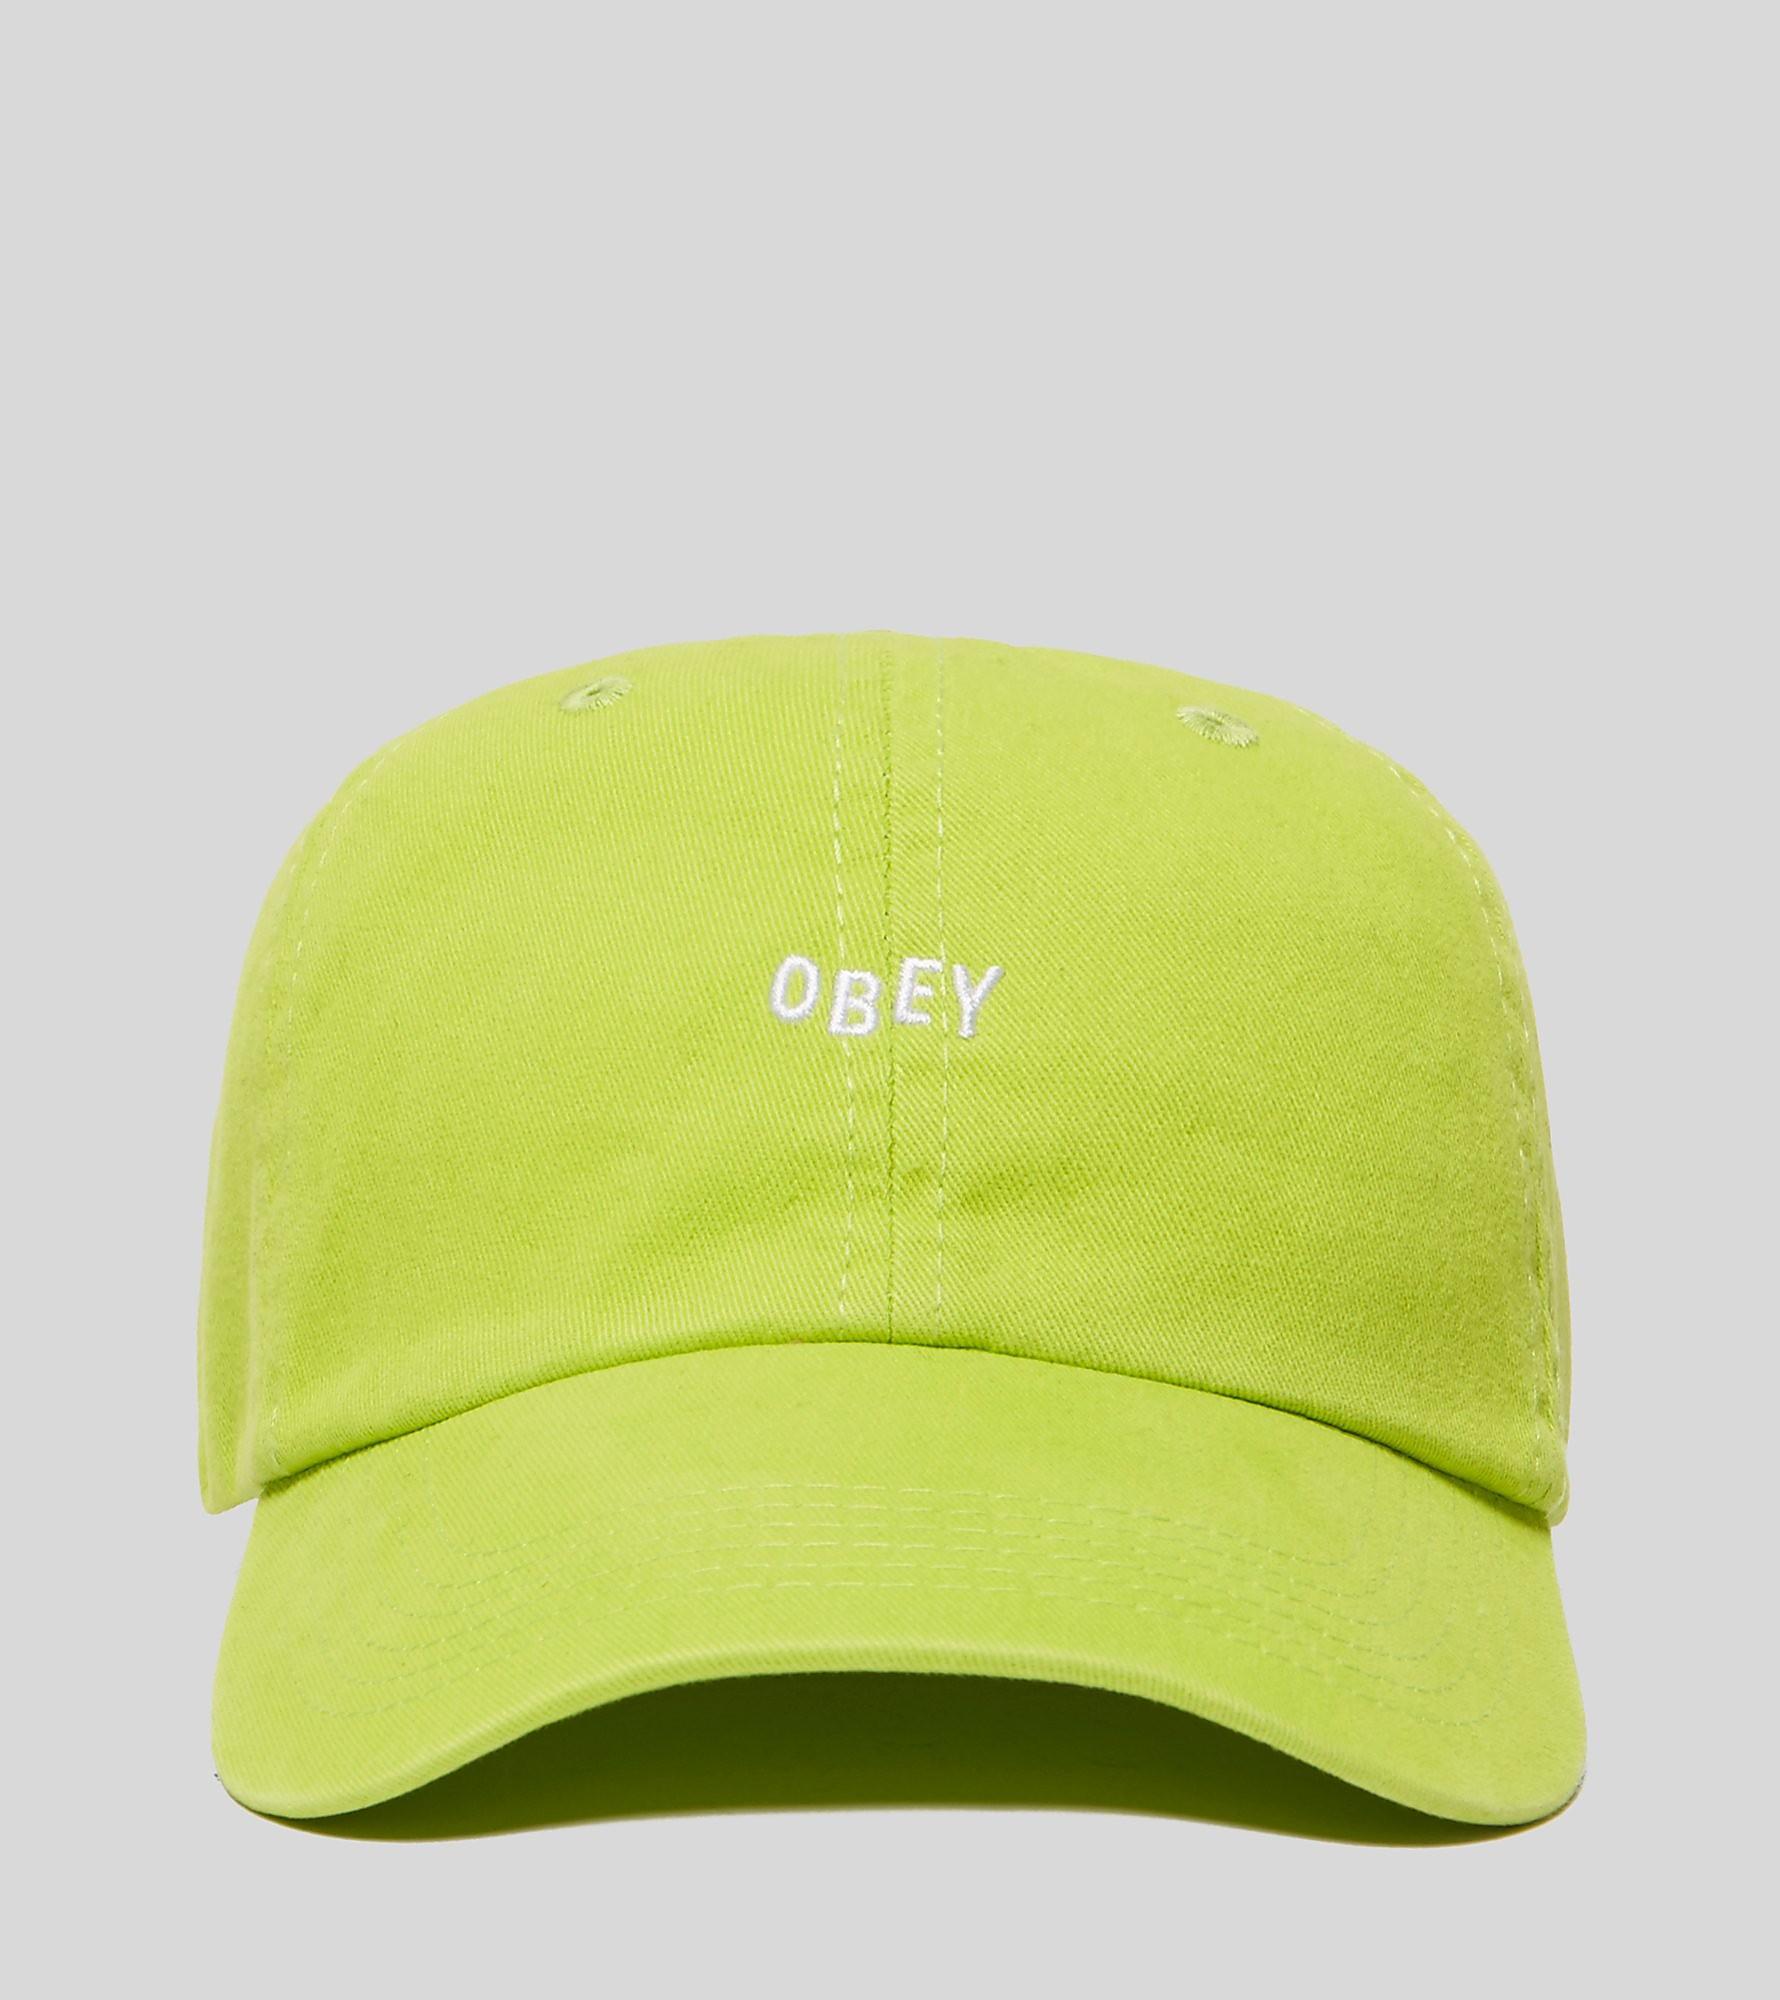 Obey Jumble Bar Strapback Cap